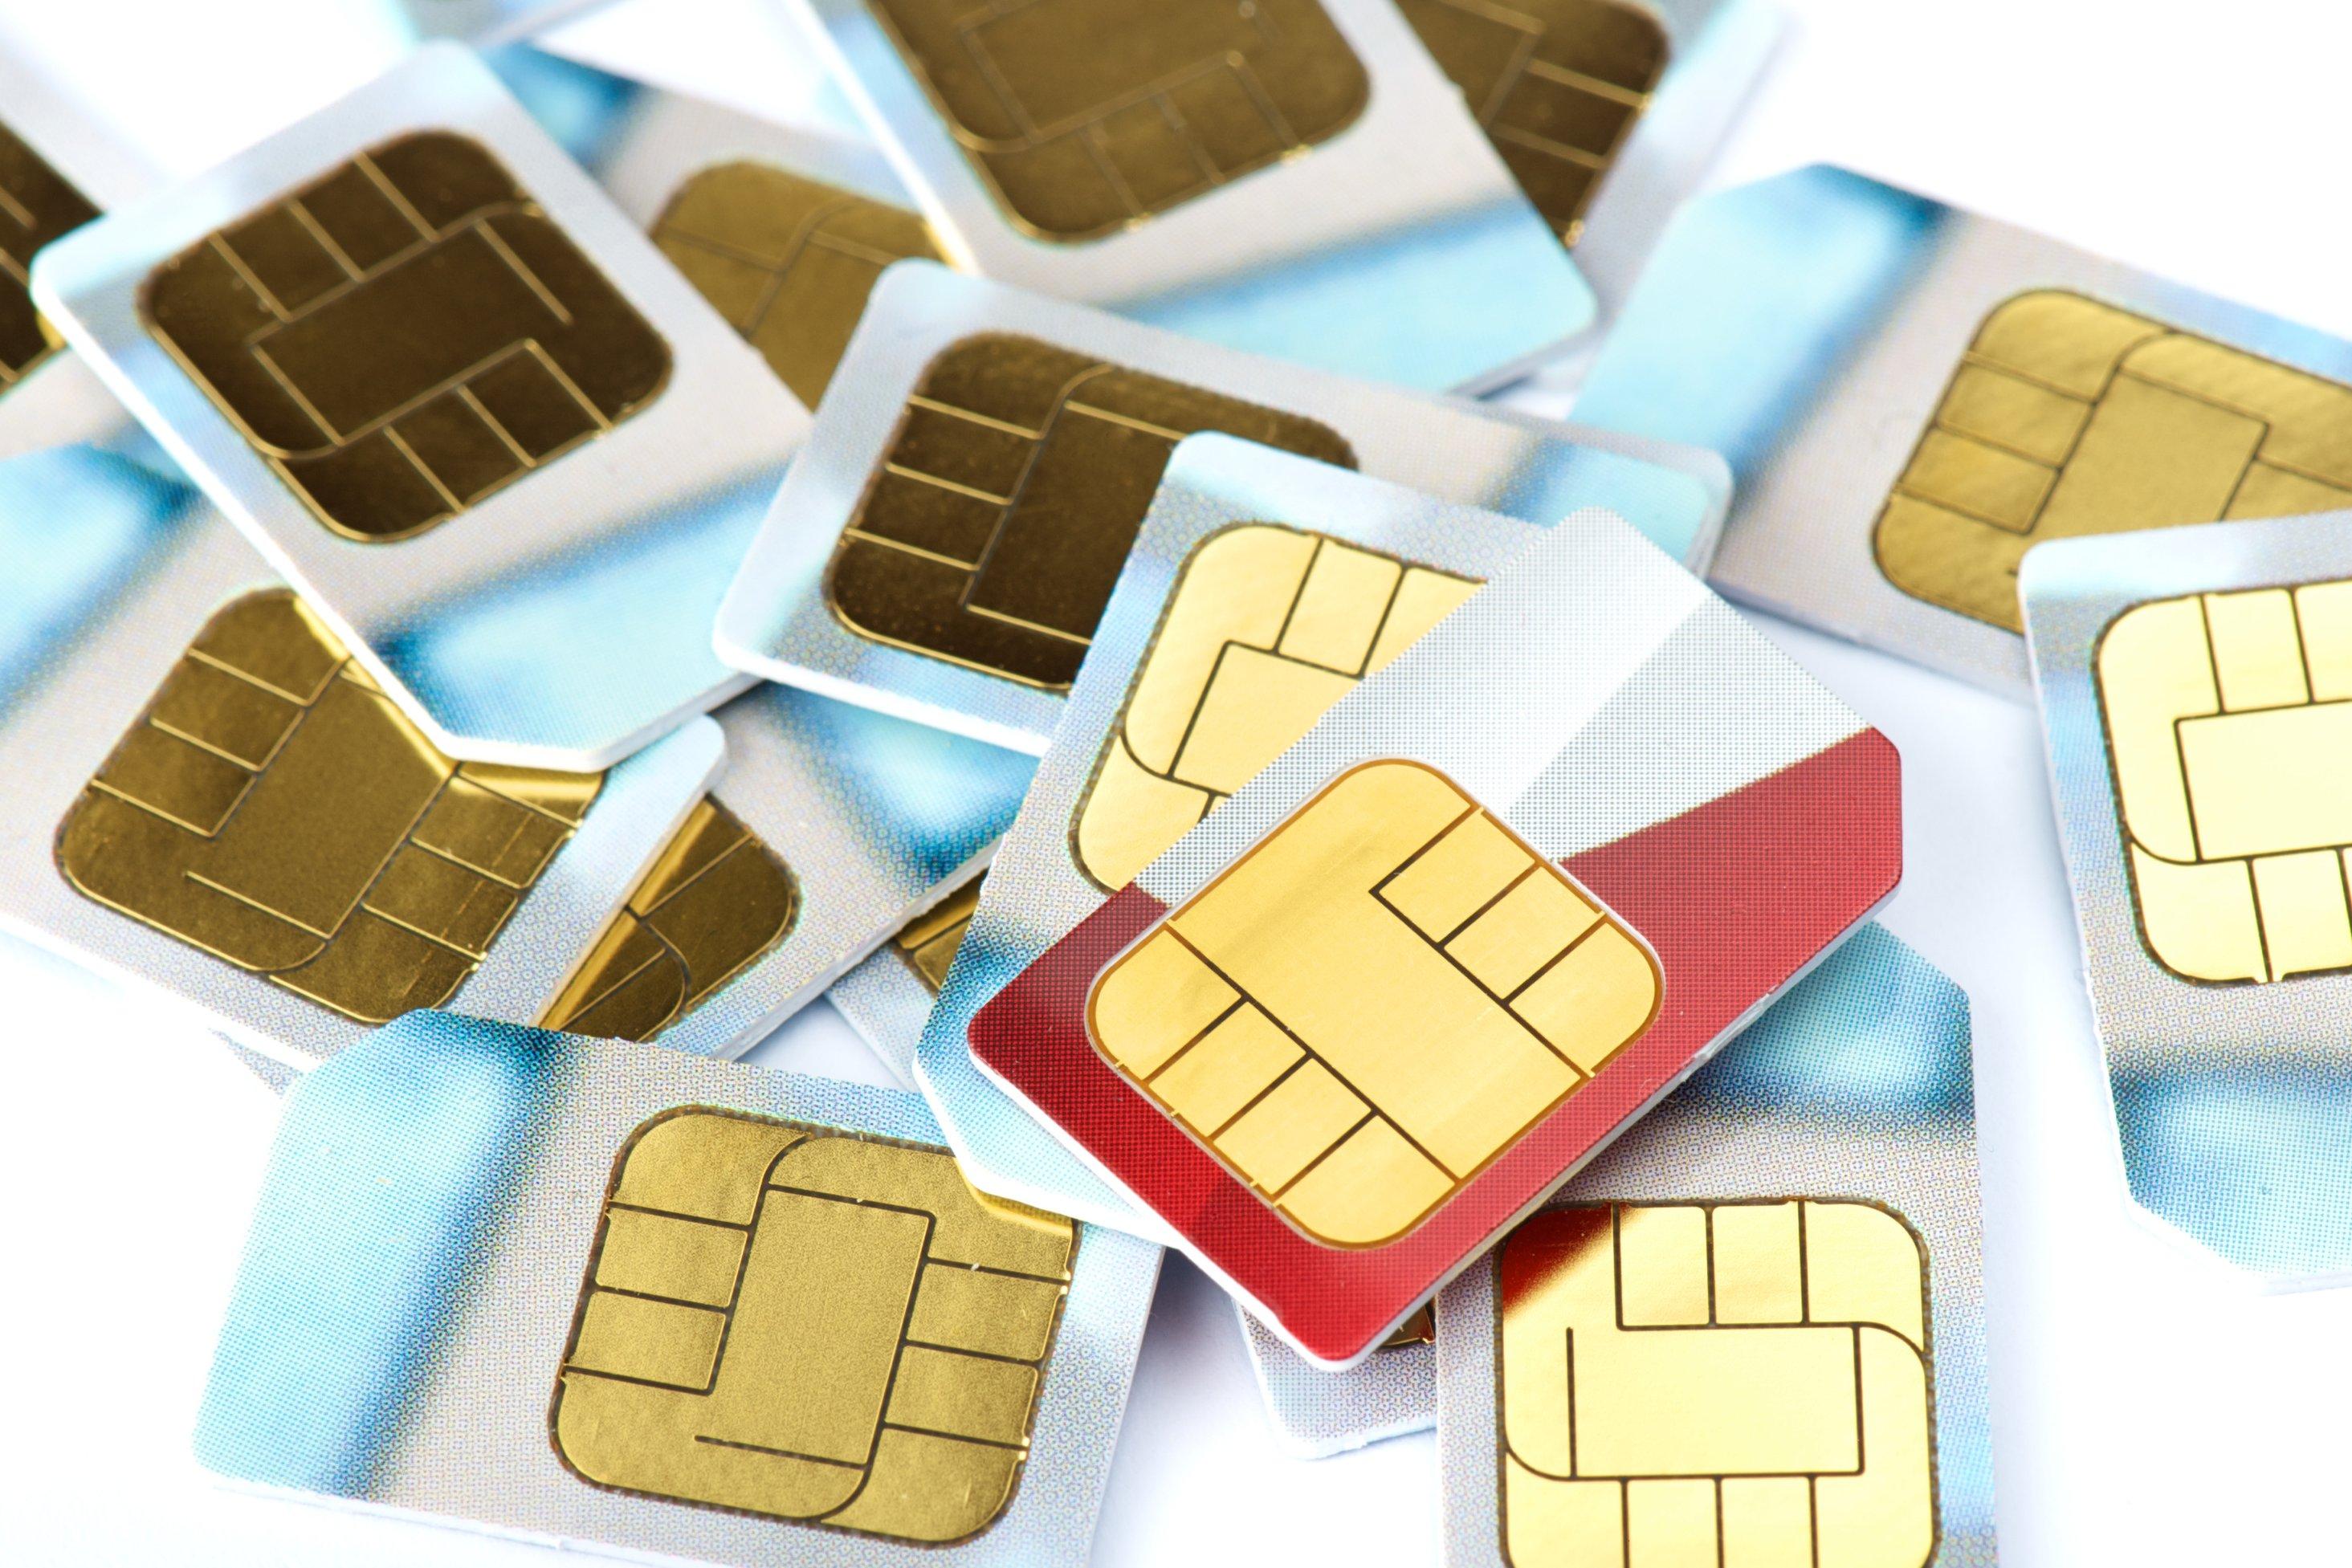 Mobile phone SIM cards